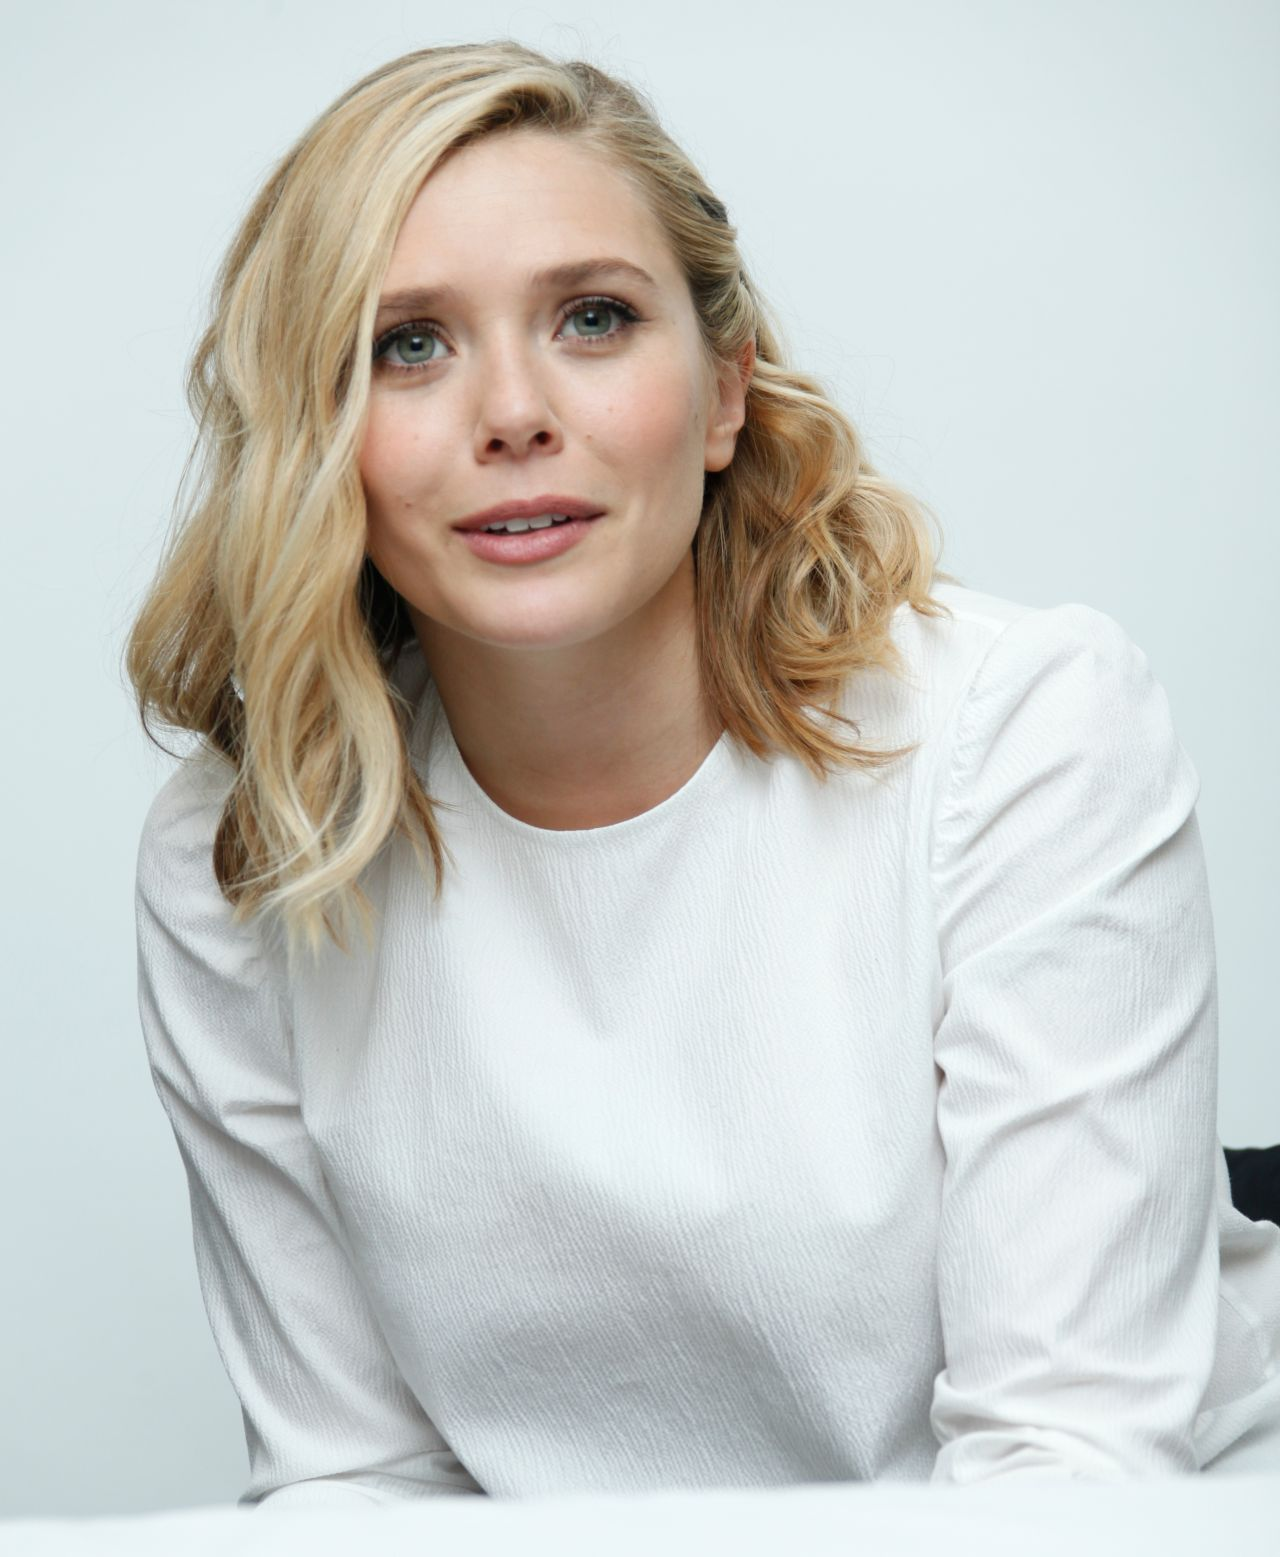 Elizabeth Olsen Avengers Age Of Ultron Press Conference